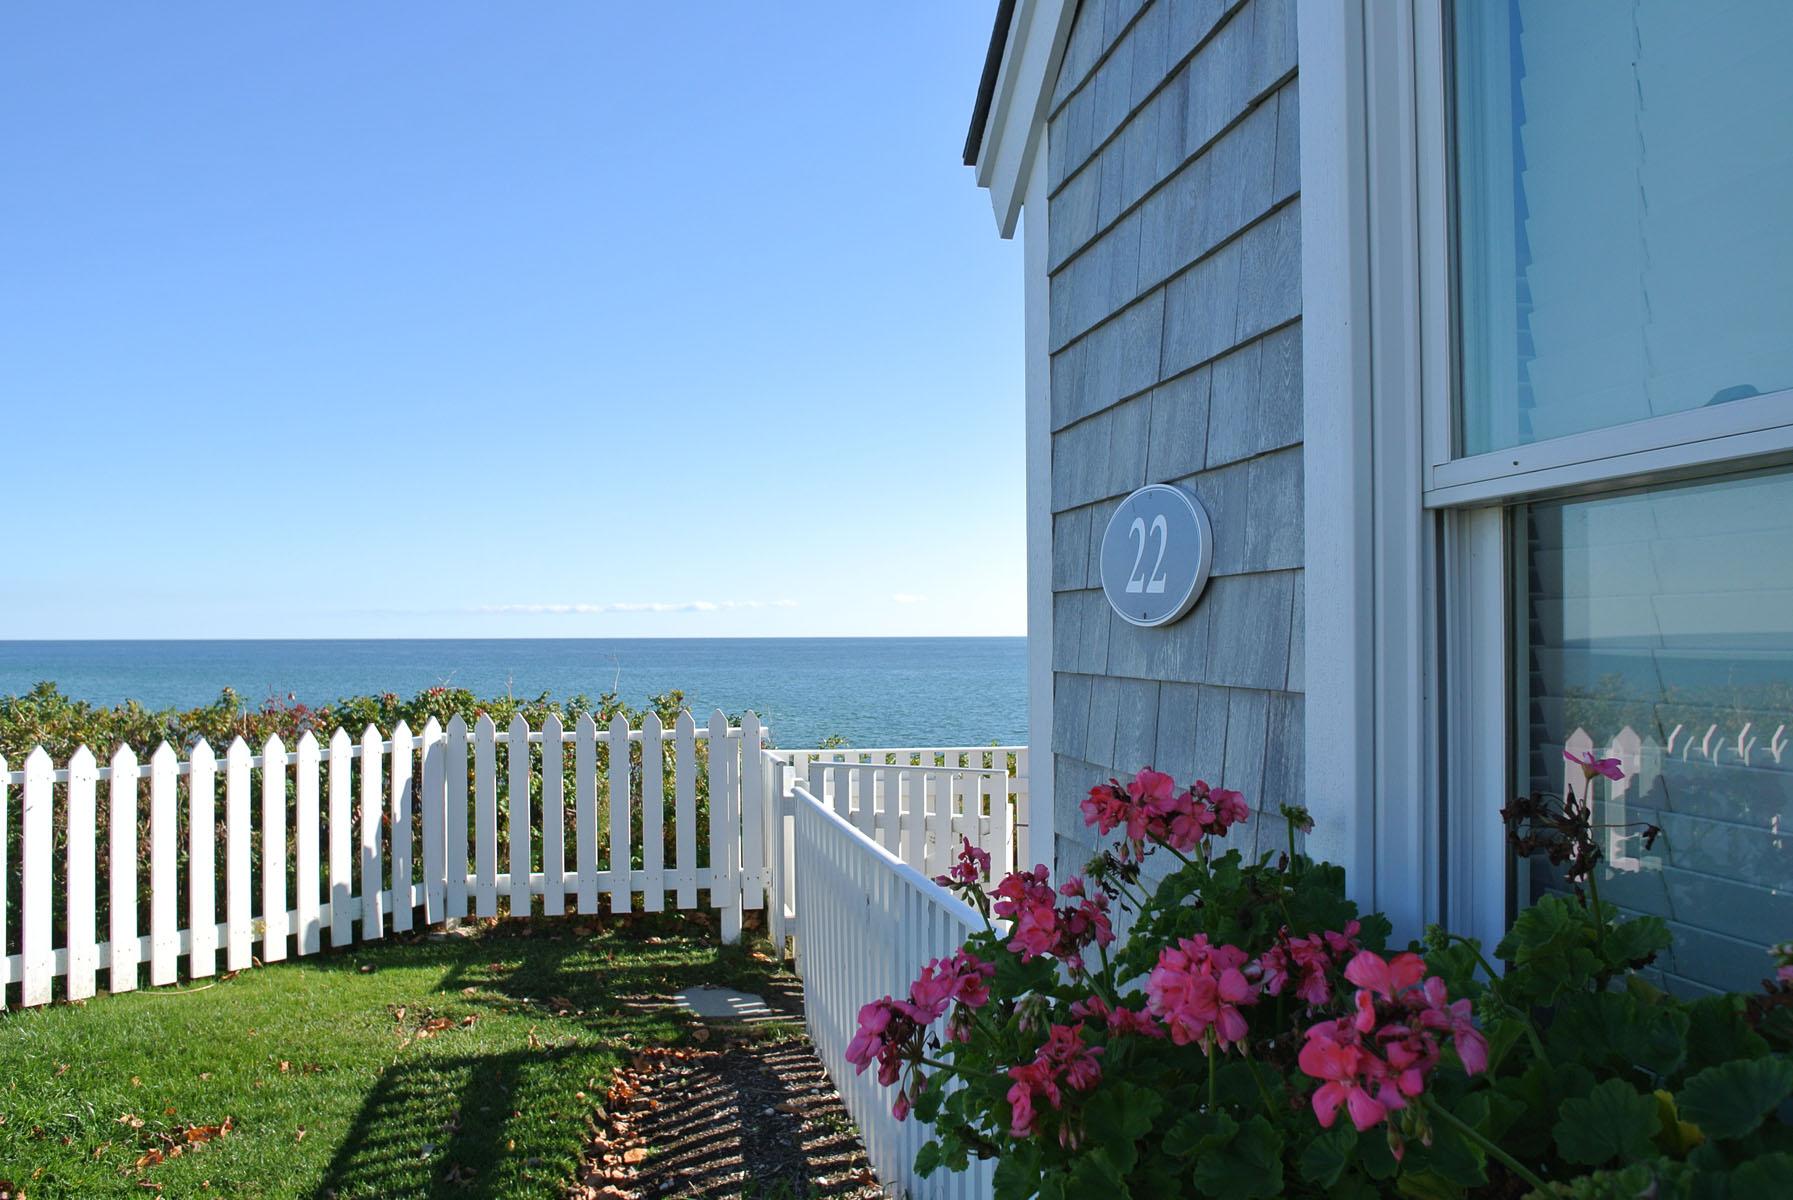 獨棟家庭住宅 為 出售 在 OCEAN VIEW COTTAGE 22 Milestone Way Unit 607 Mashpee, 麻塞諸塞州, 02649 美國在/周邊: Mashpee